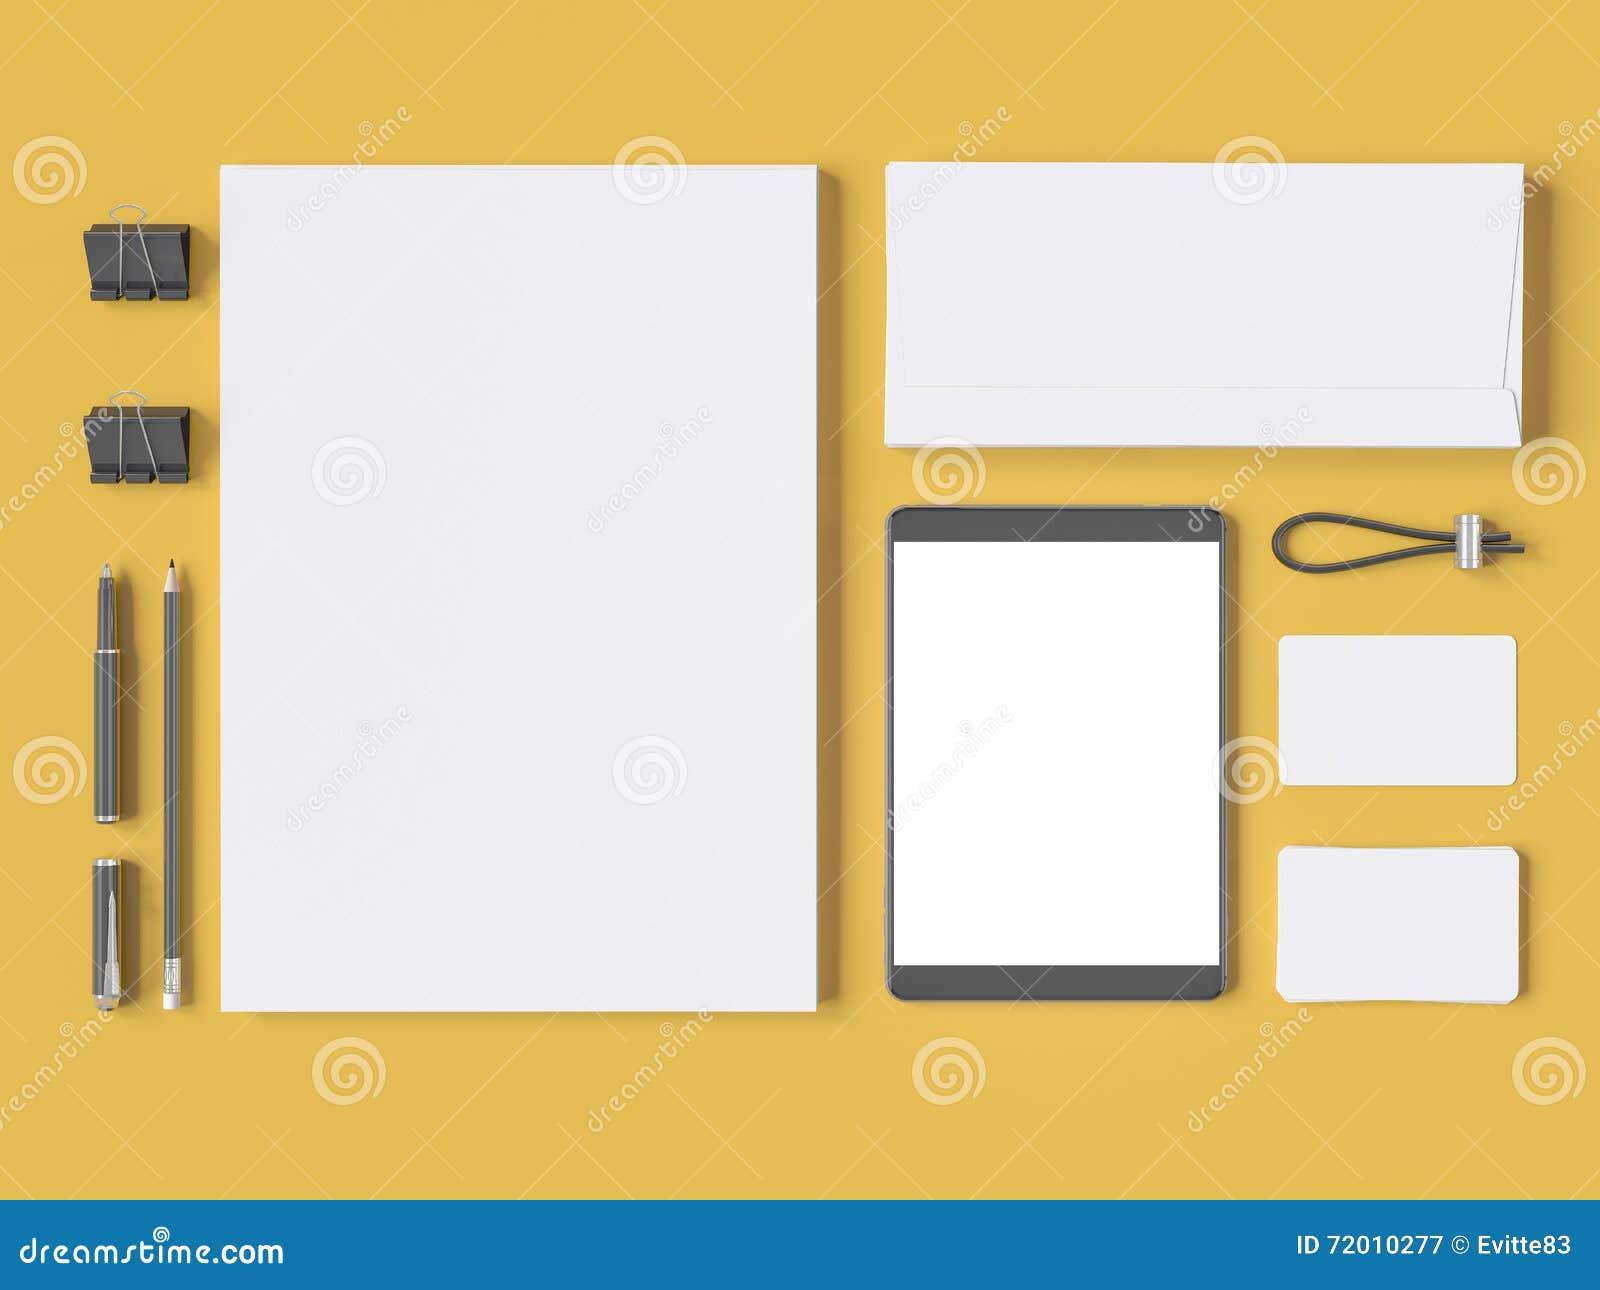 Grey Branding Mockup Template Set On Yellow Background